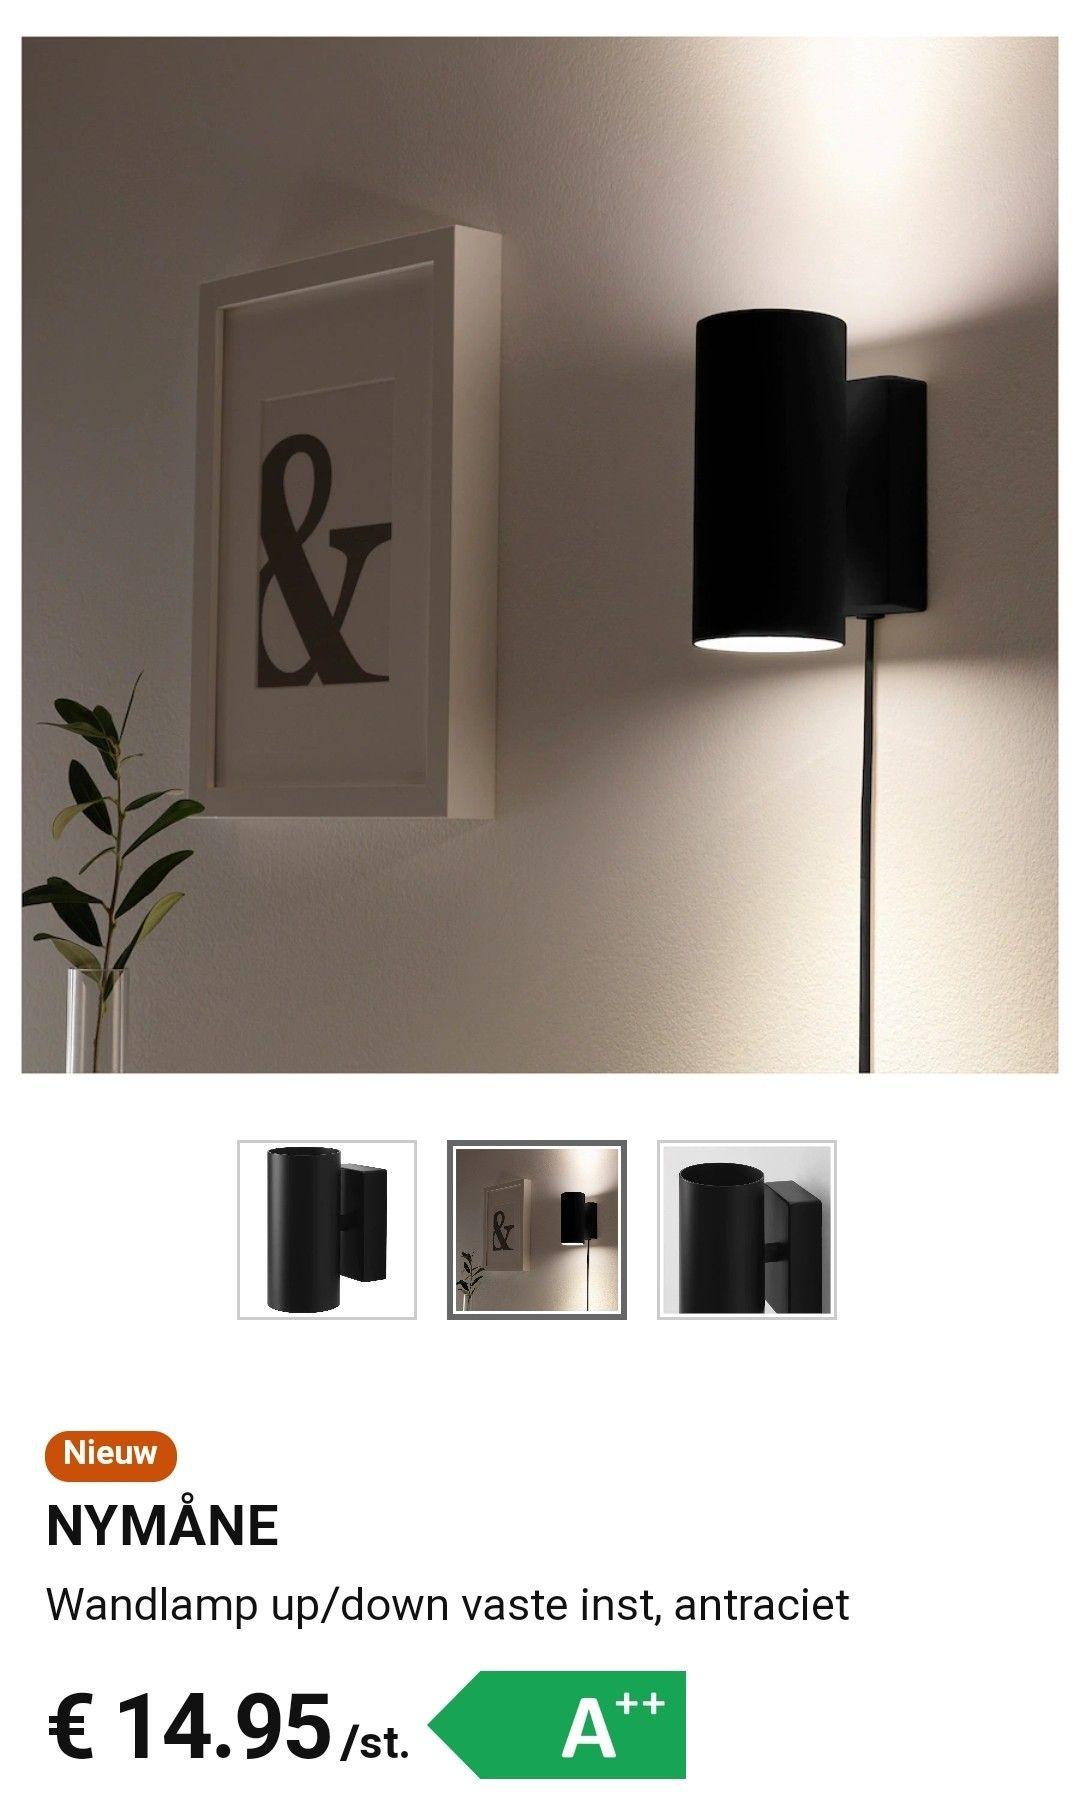 Ikea Nymane Interieur Slaapkamer Wandlamp Interieur